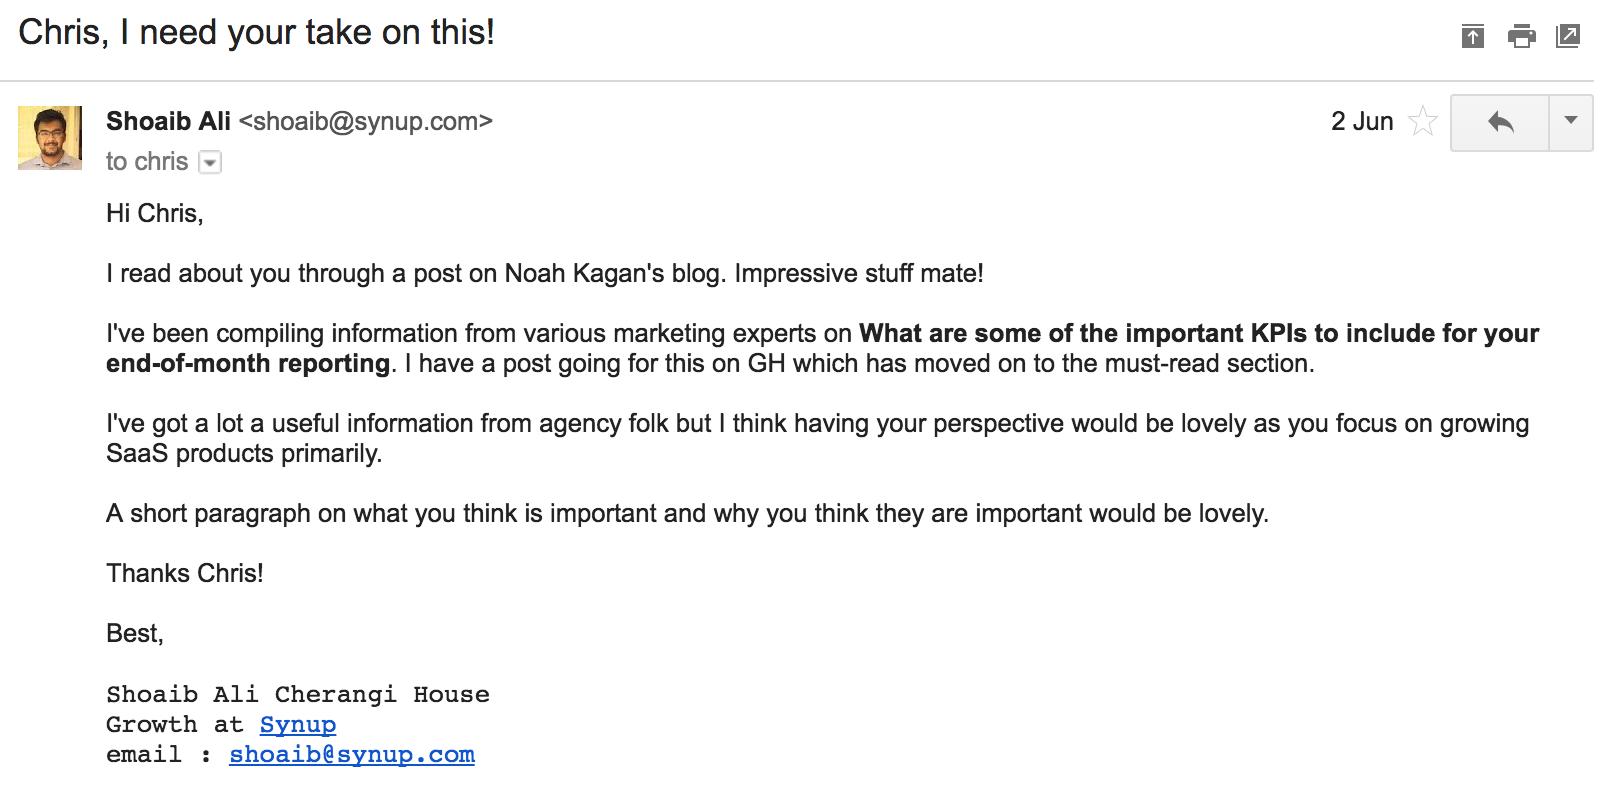 Screenshot showing an email sent to Chris Von Wilpert